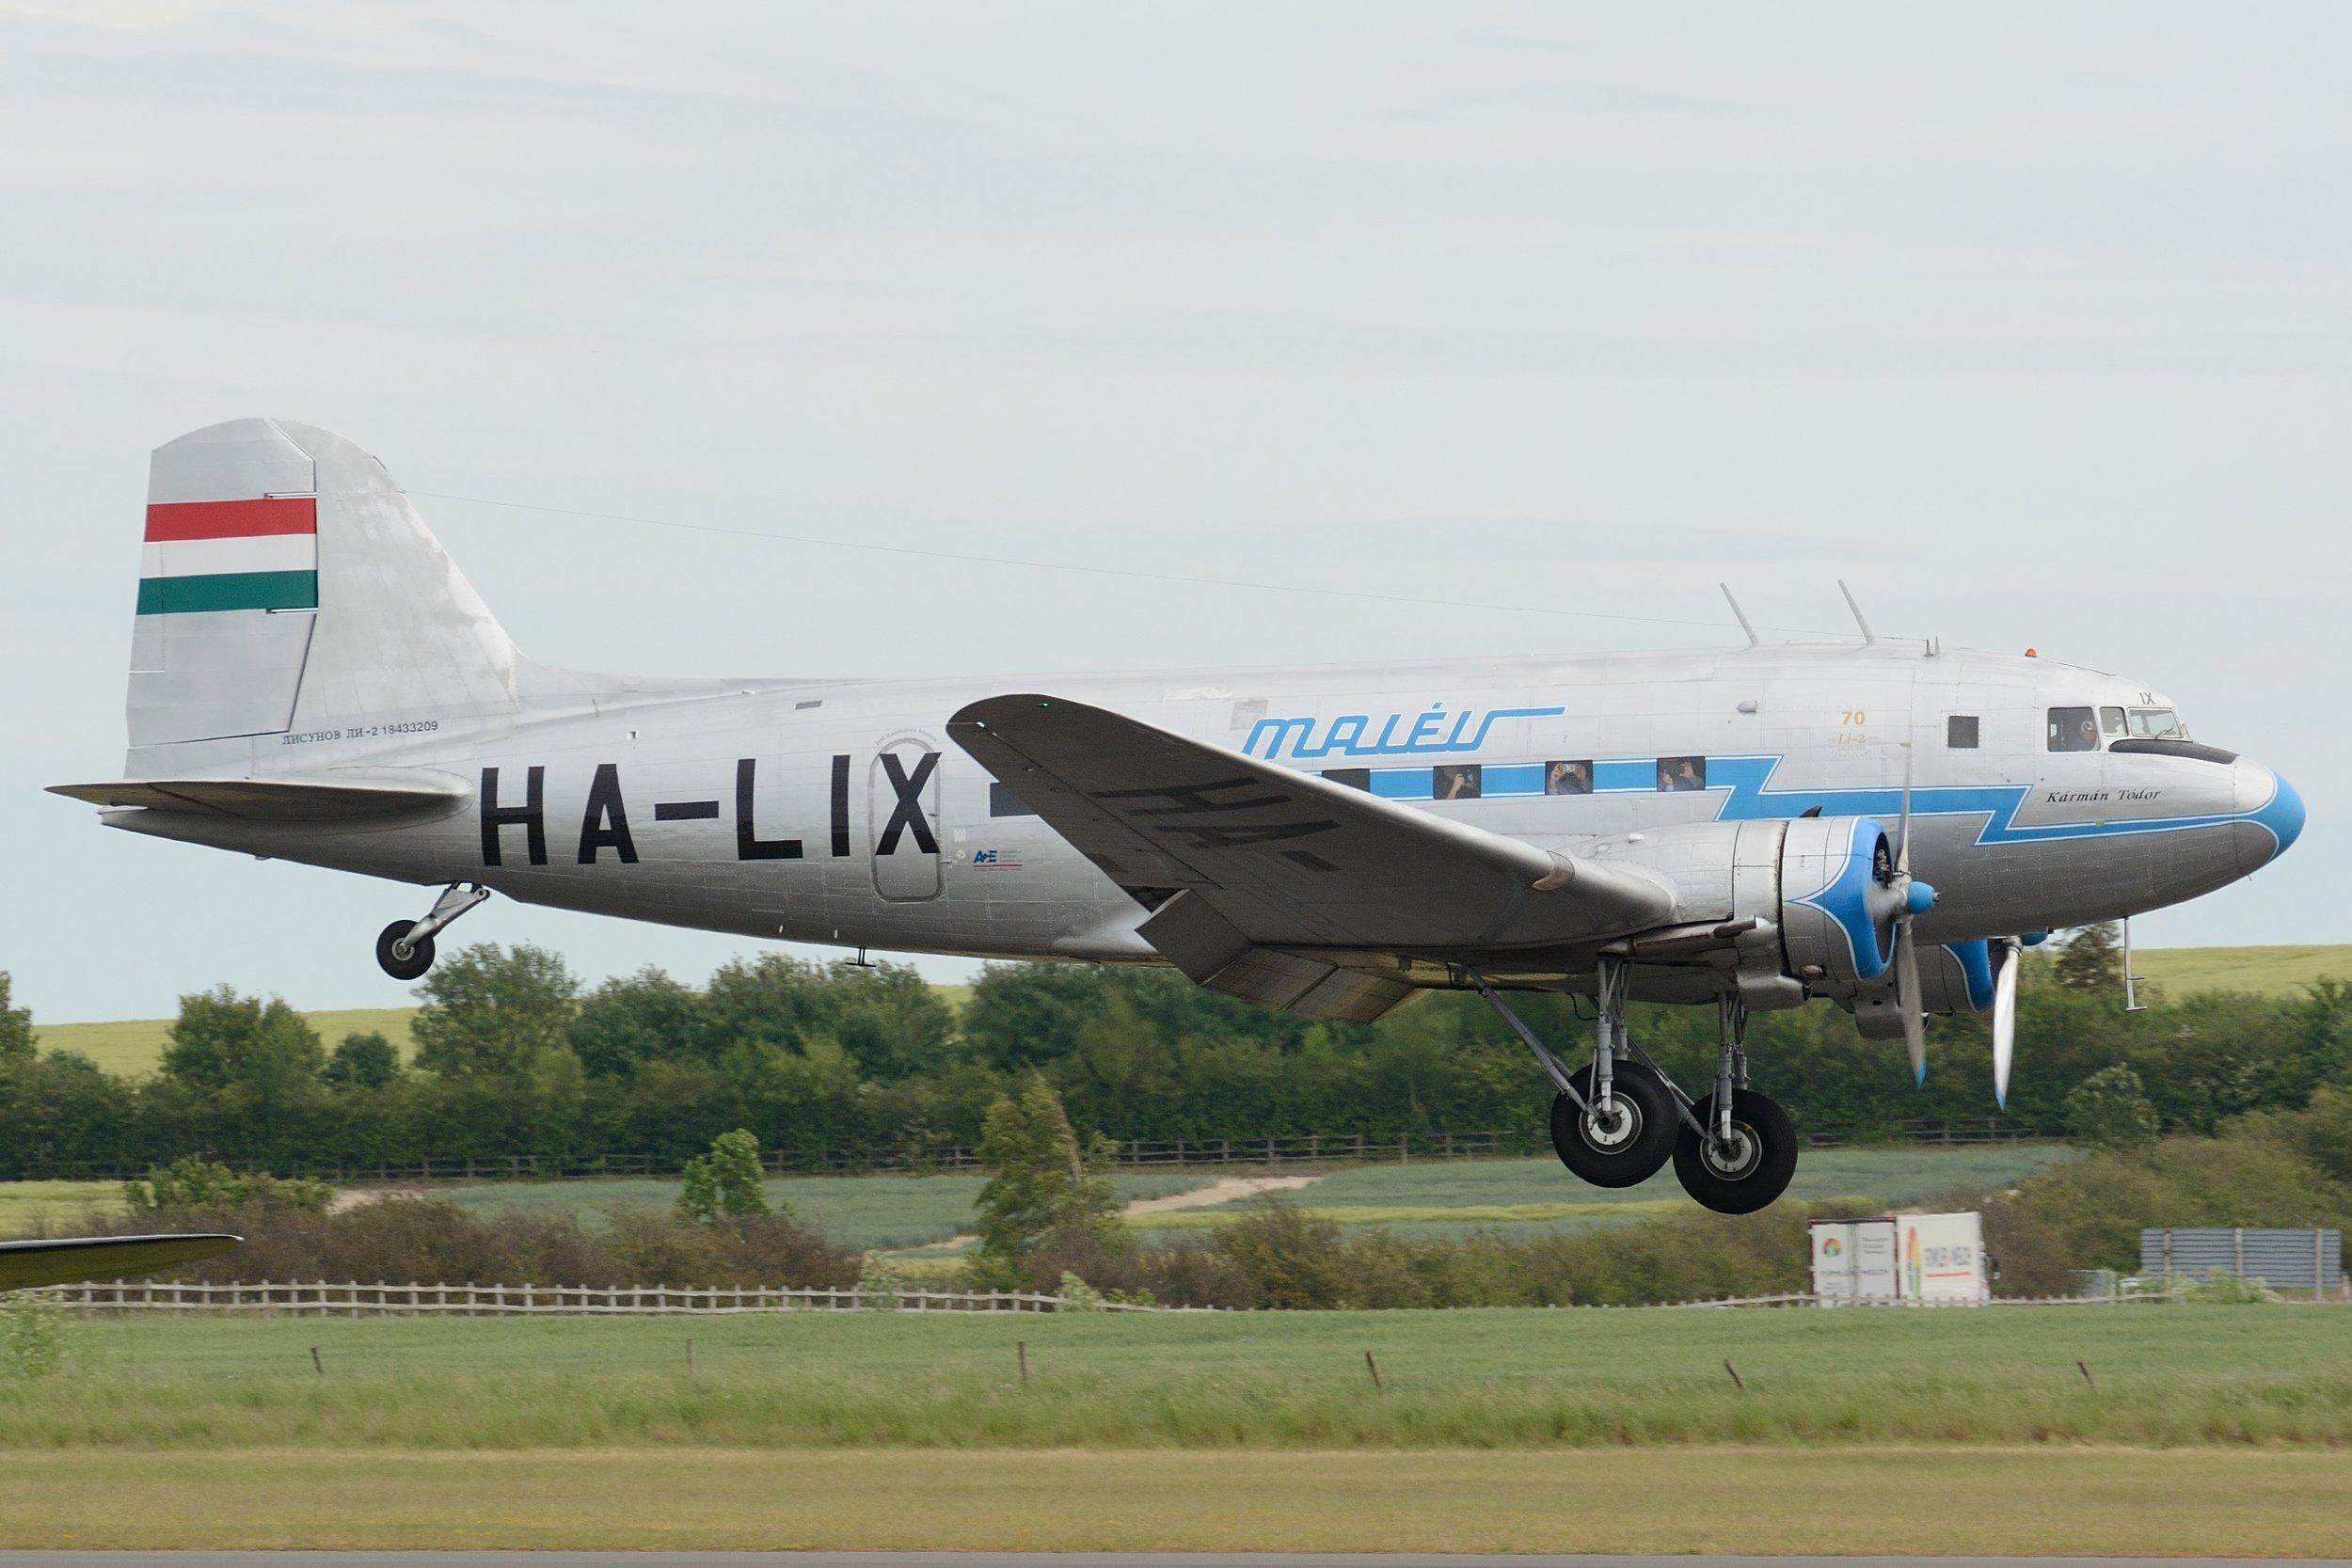 Li 2 HA-LIX landing at Duxford Sunday 2nd June 2019. Photo: Paul Watson.